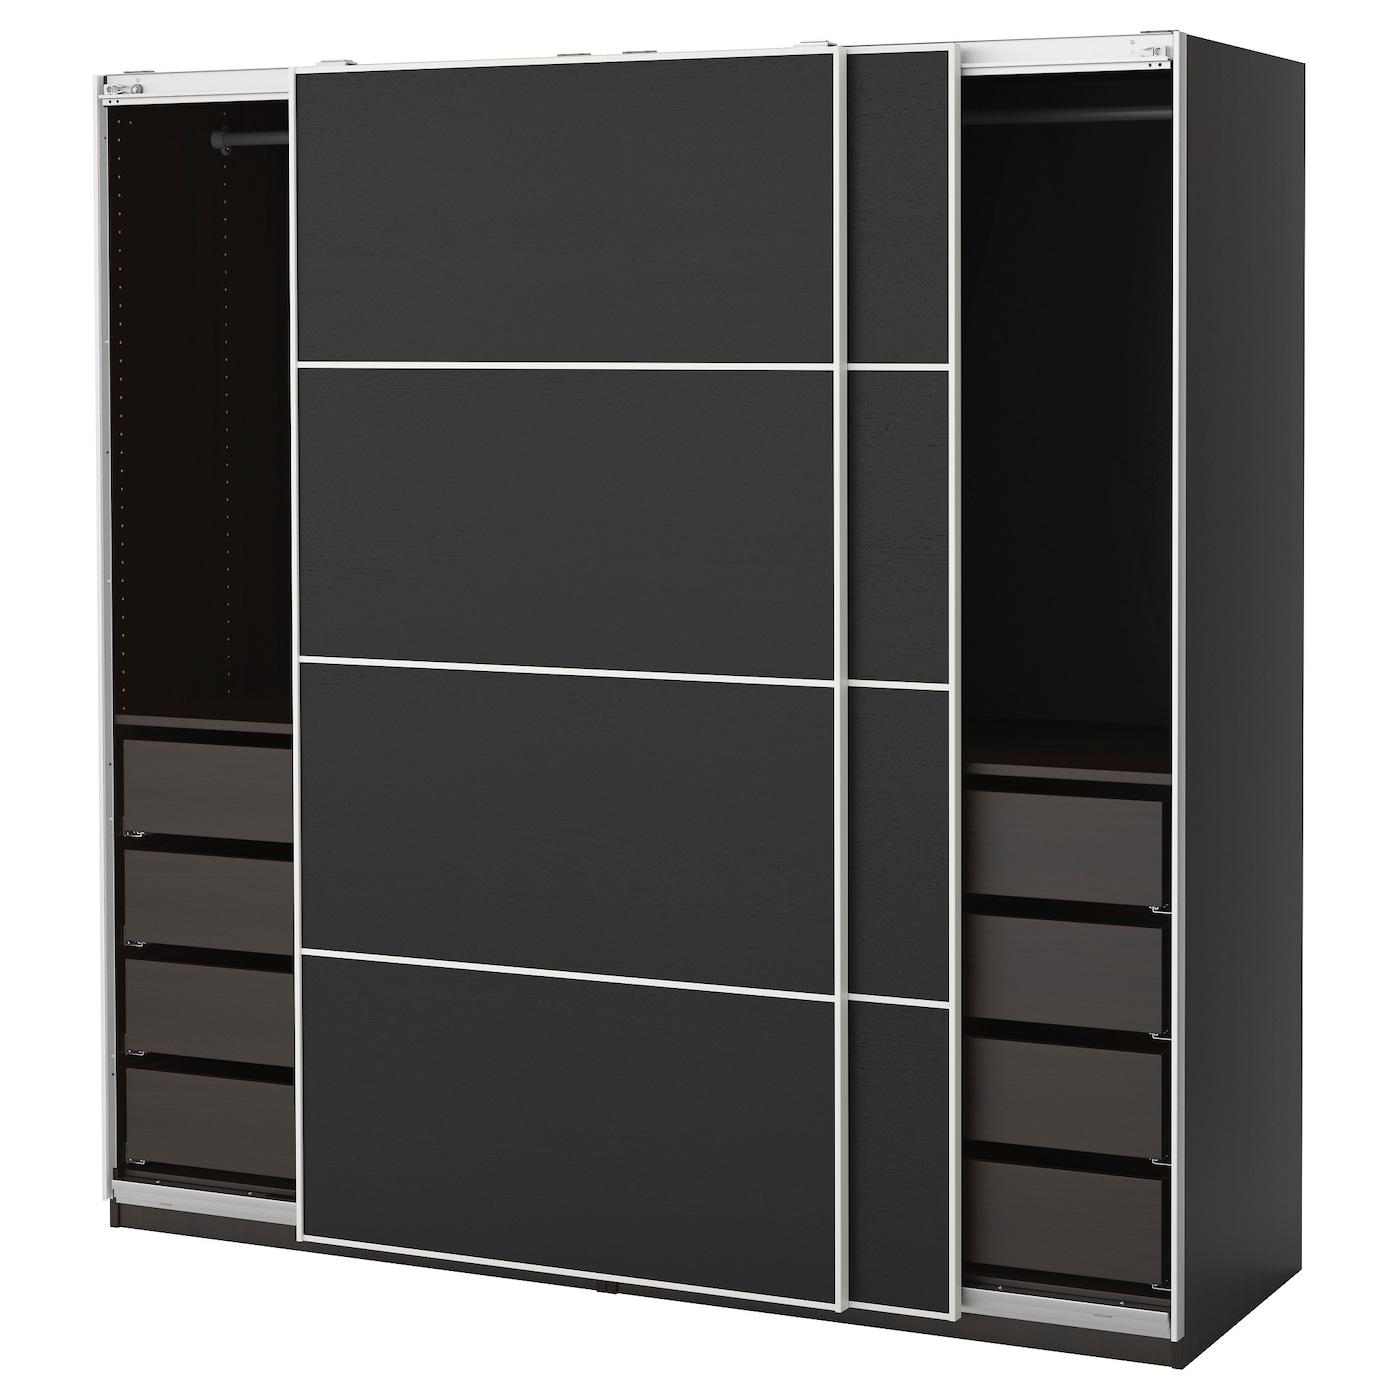 Pax wardrobe black brown ilseng black brown 200x66x201 cm for Ikea pax planen